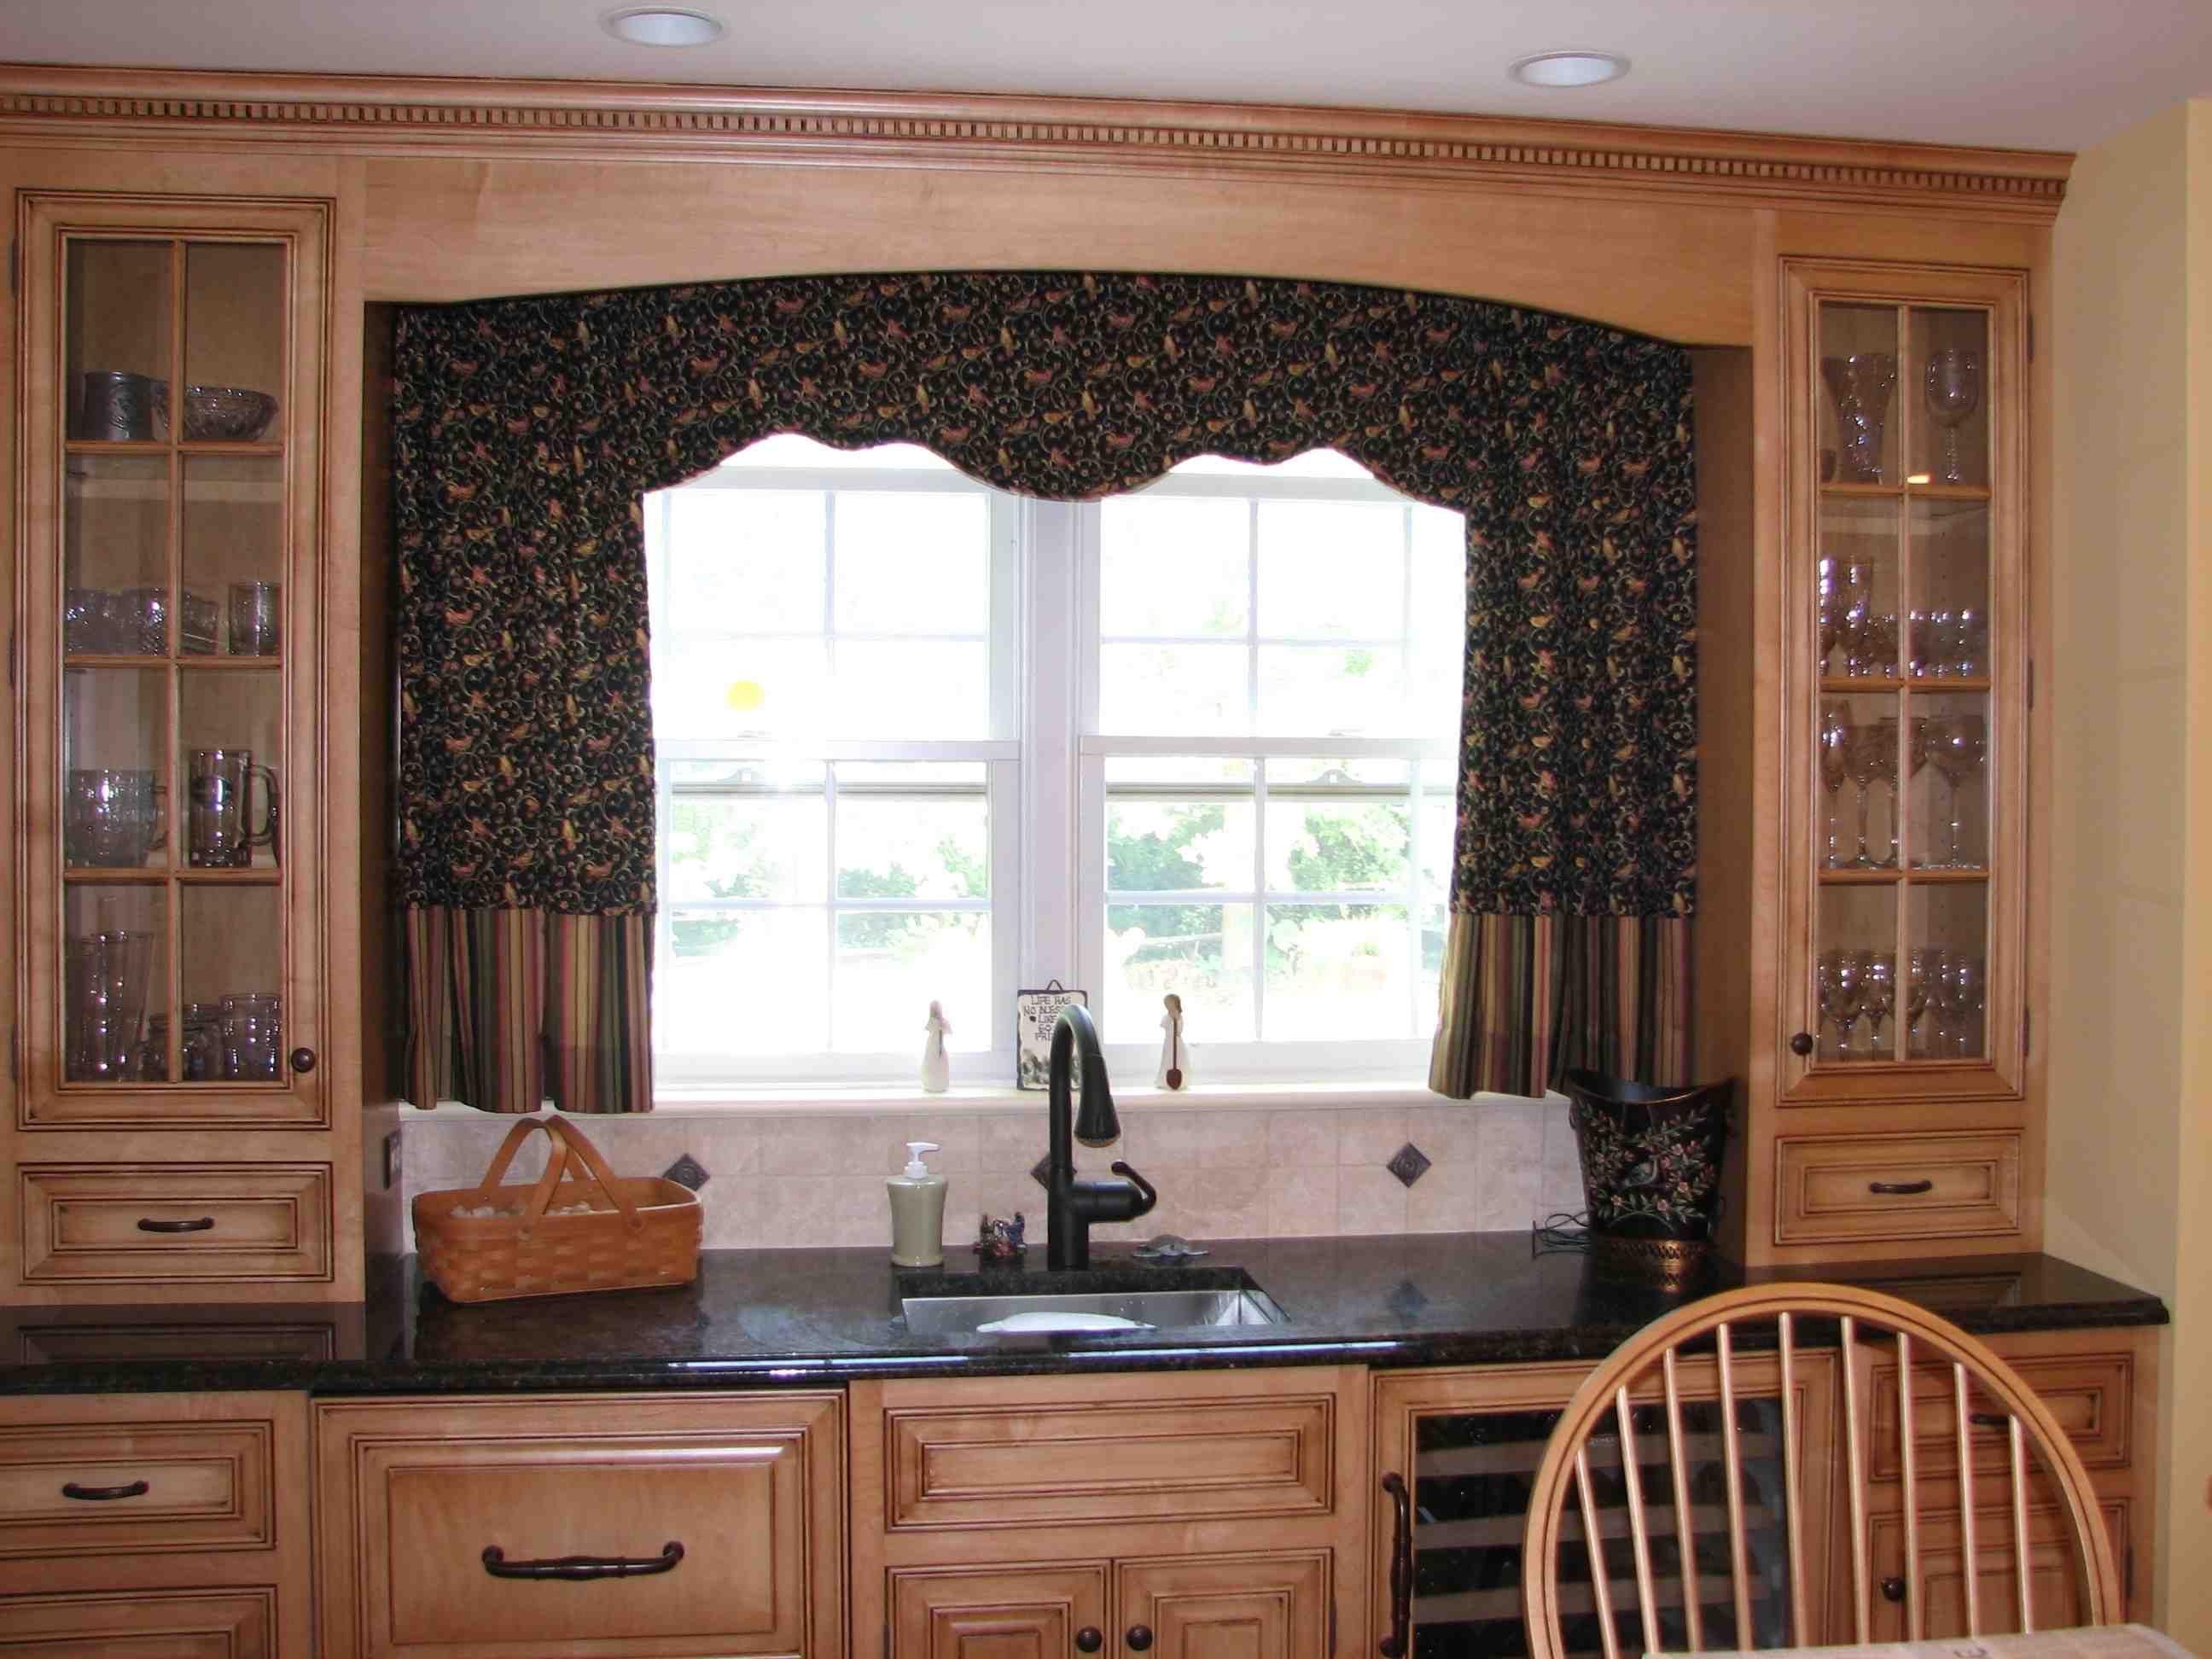 Outside window treatment ideas  ravishing faux silk double kitchen curtain ideas added over valance